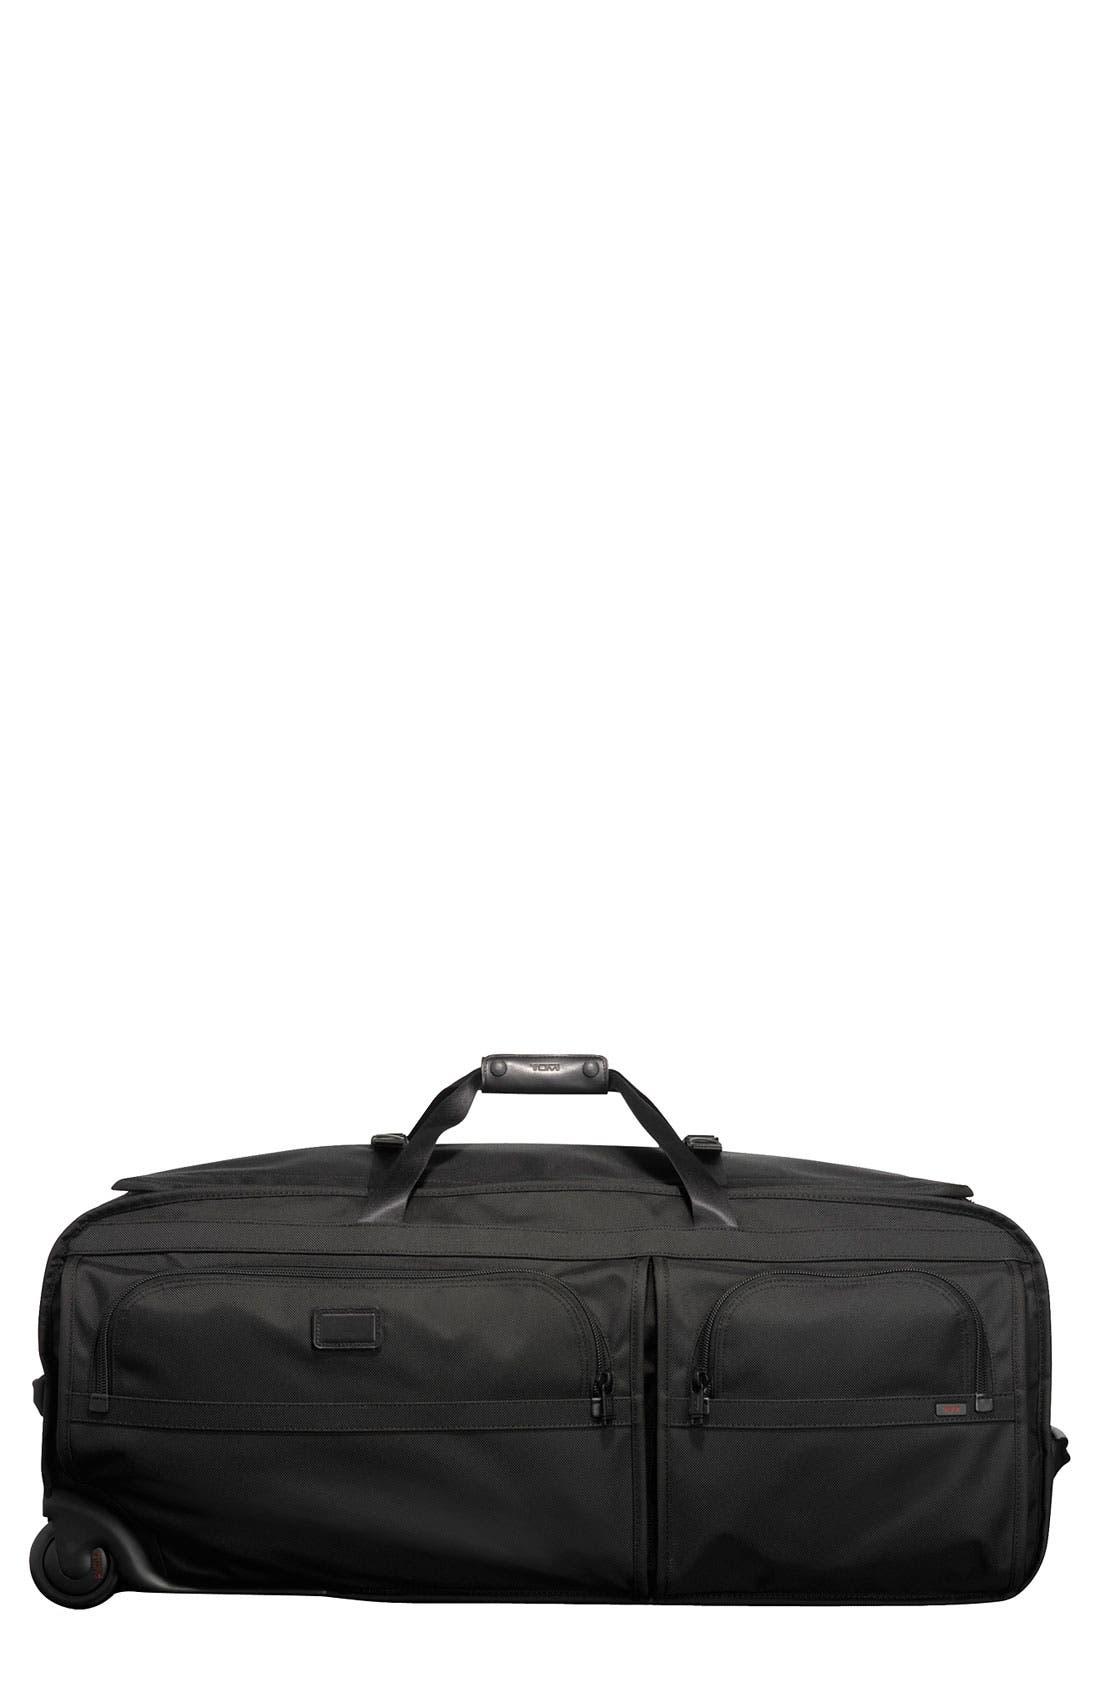 Main Image - Tumi 'Alpha - Extra Large' Wheeled Duffel Bag